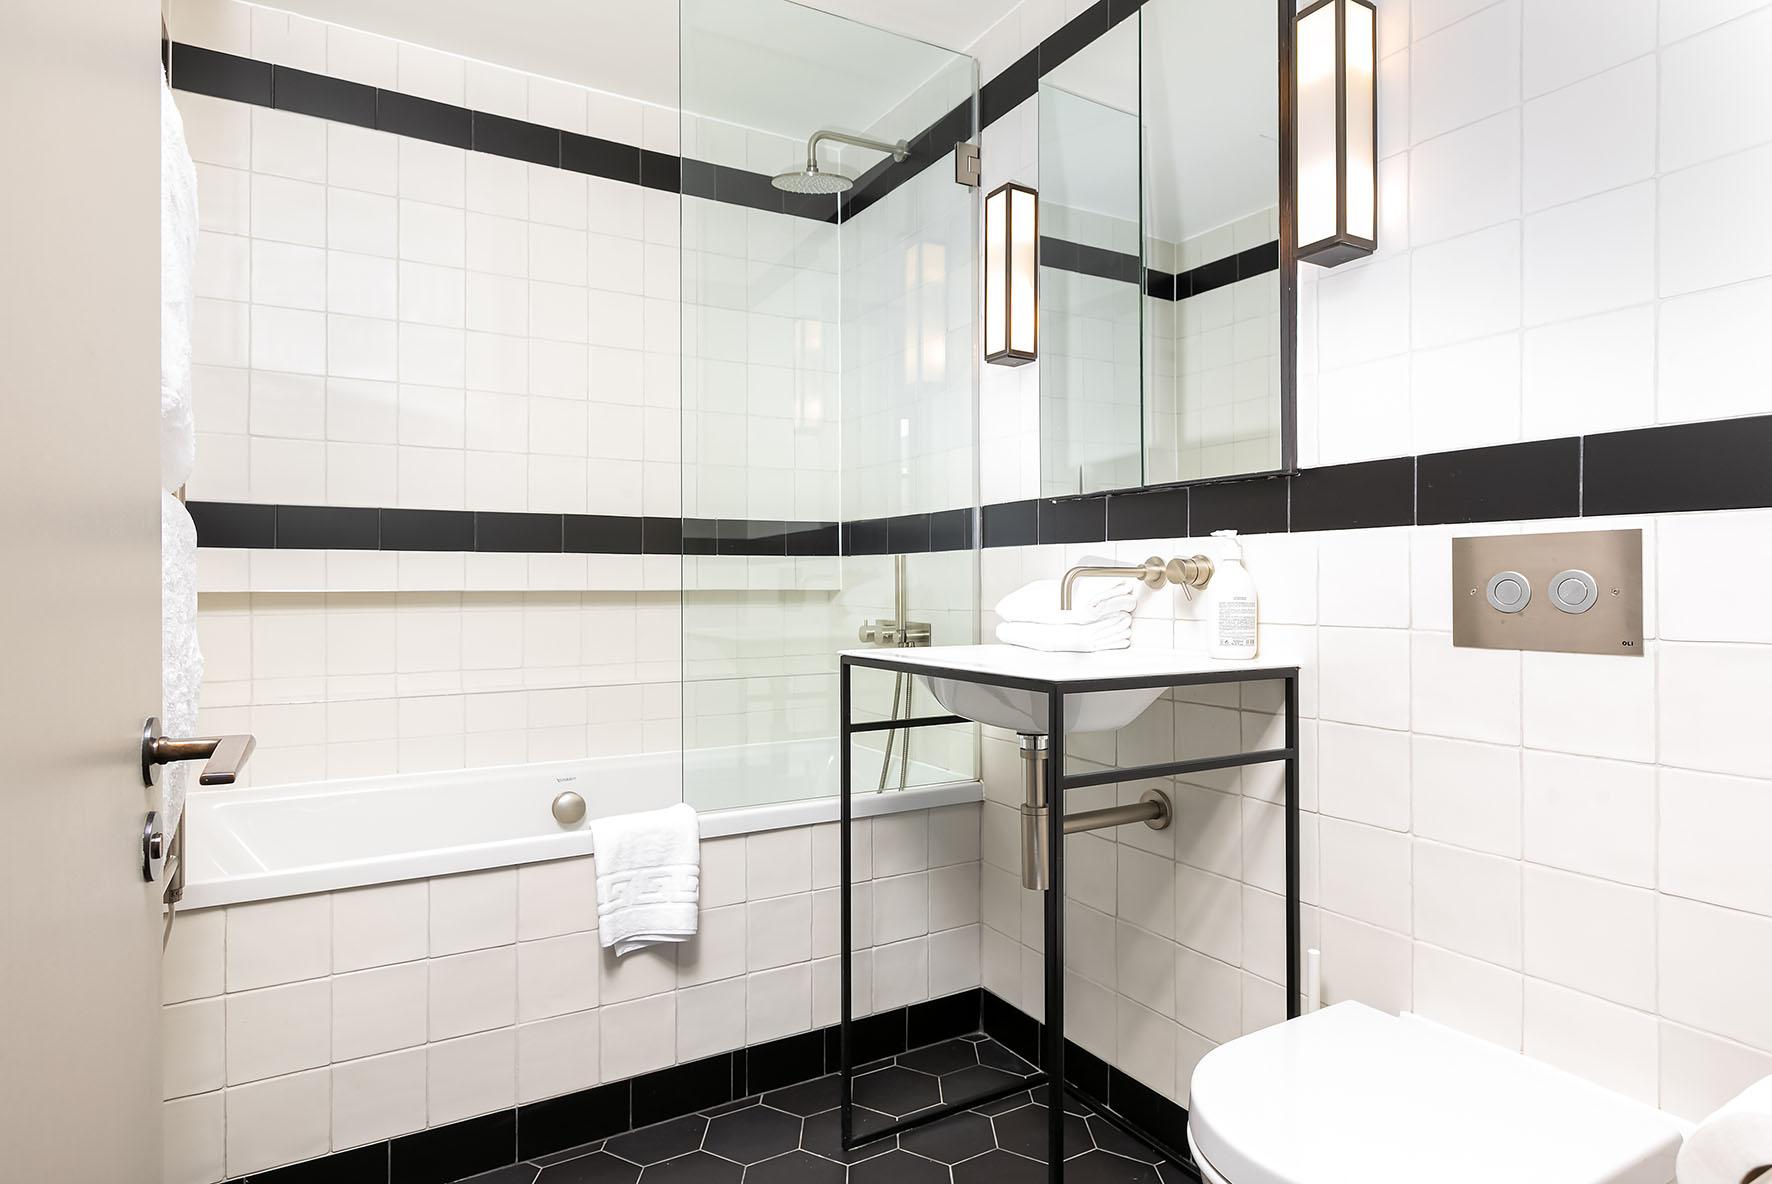 Lovelydays luxury service apartment rental - London - Soho - Oxford Street V - Lovelysuite - 1 bedrooms - 1 bathrooms - Beautiful bathtub - 3743d7229203 - Lovelydays